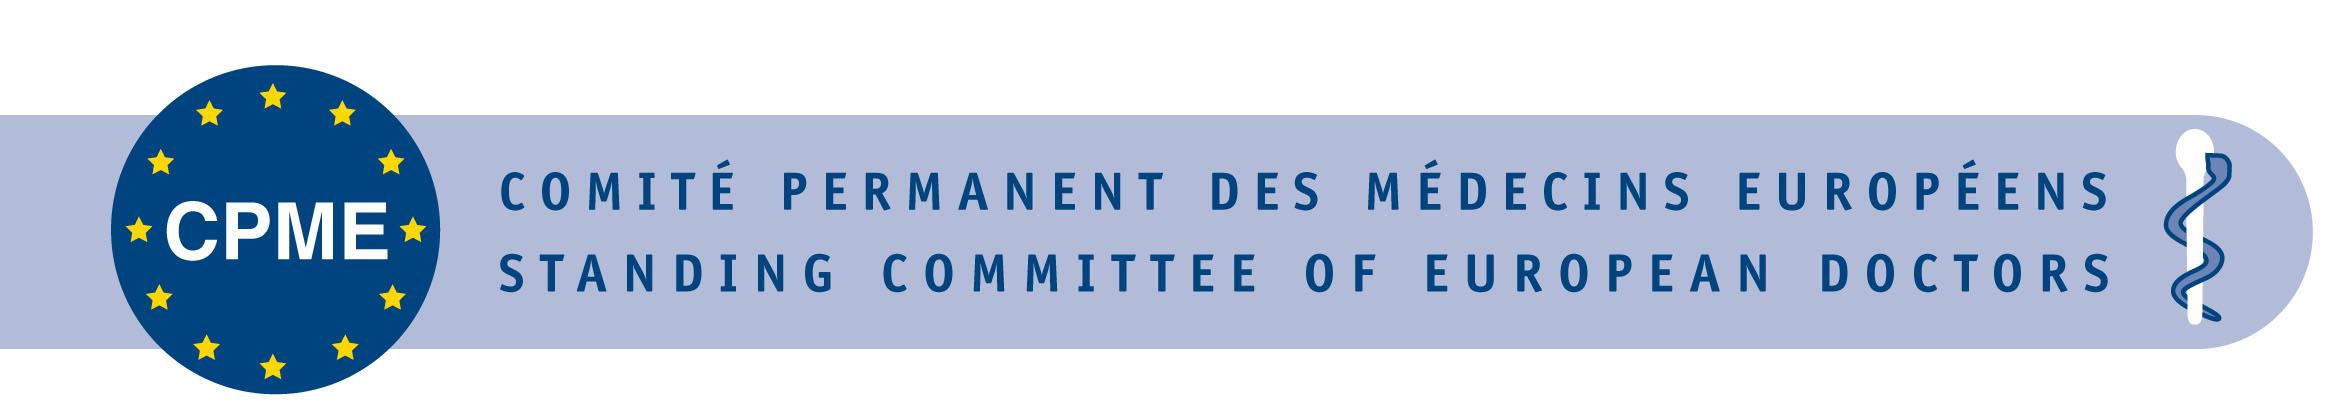 logo for Standing Committee of European Doctors